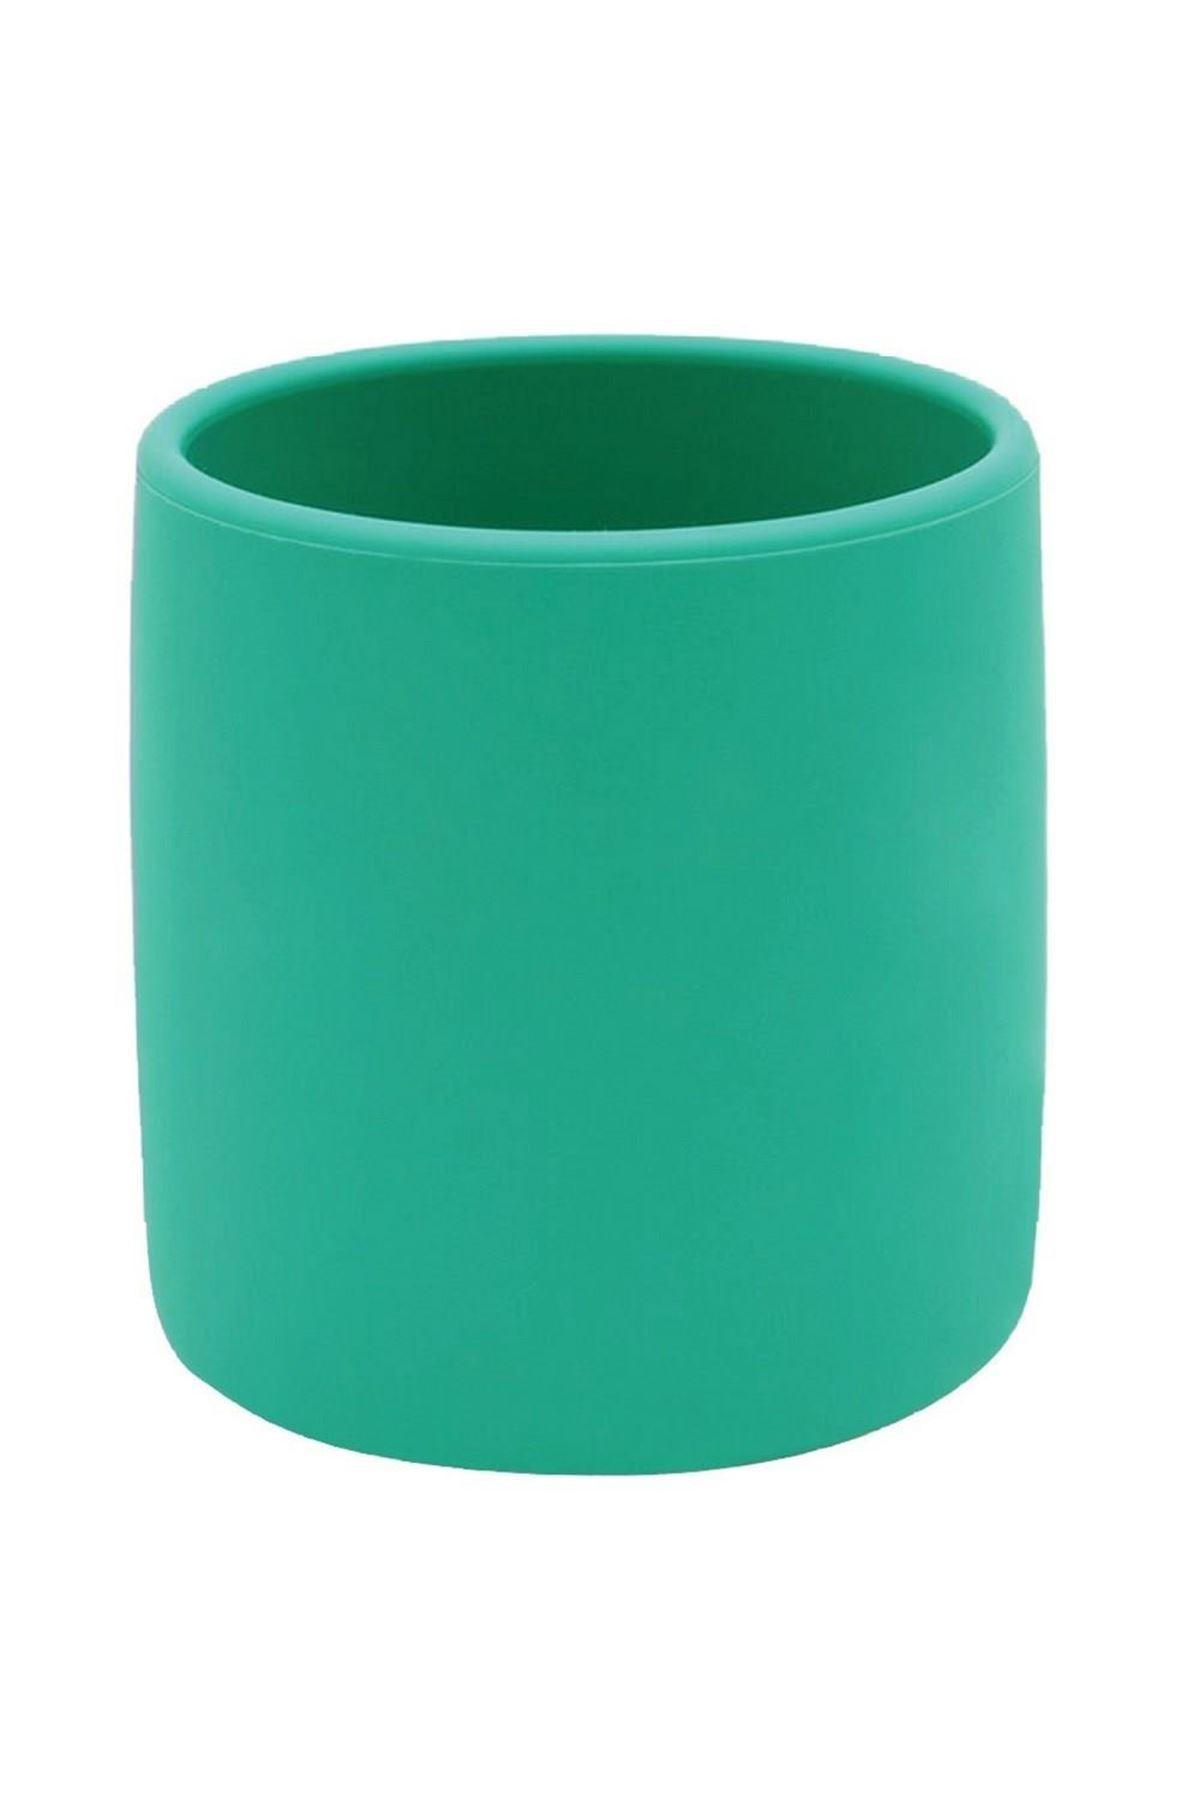 OiOi Mini Bardak Yeşil